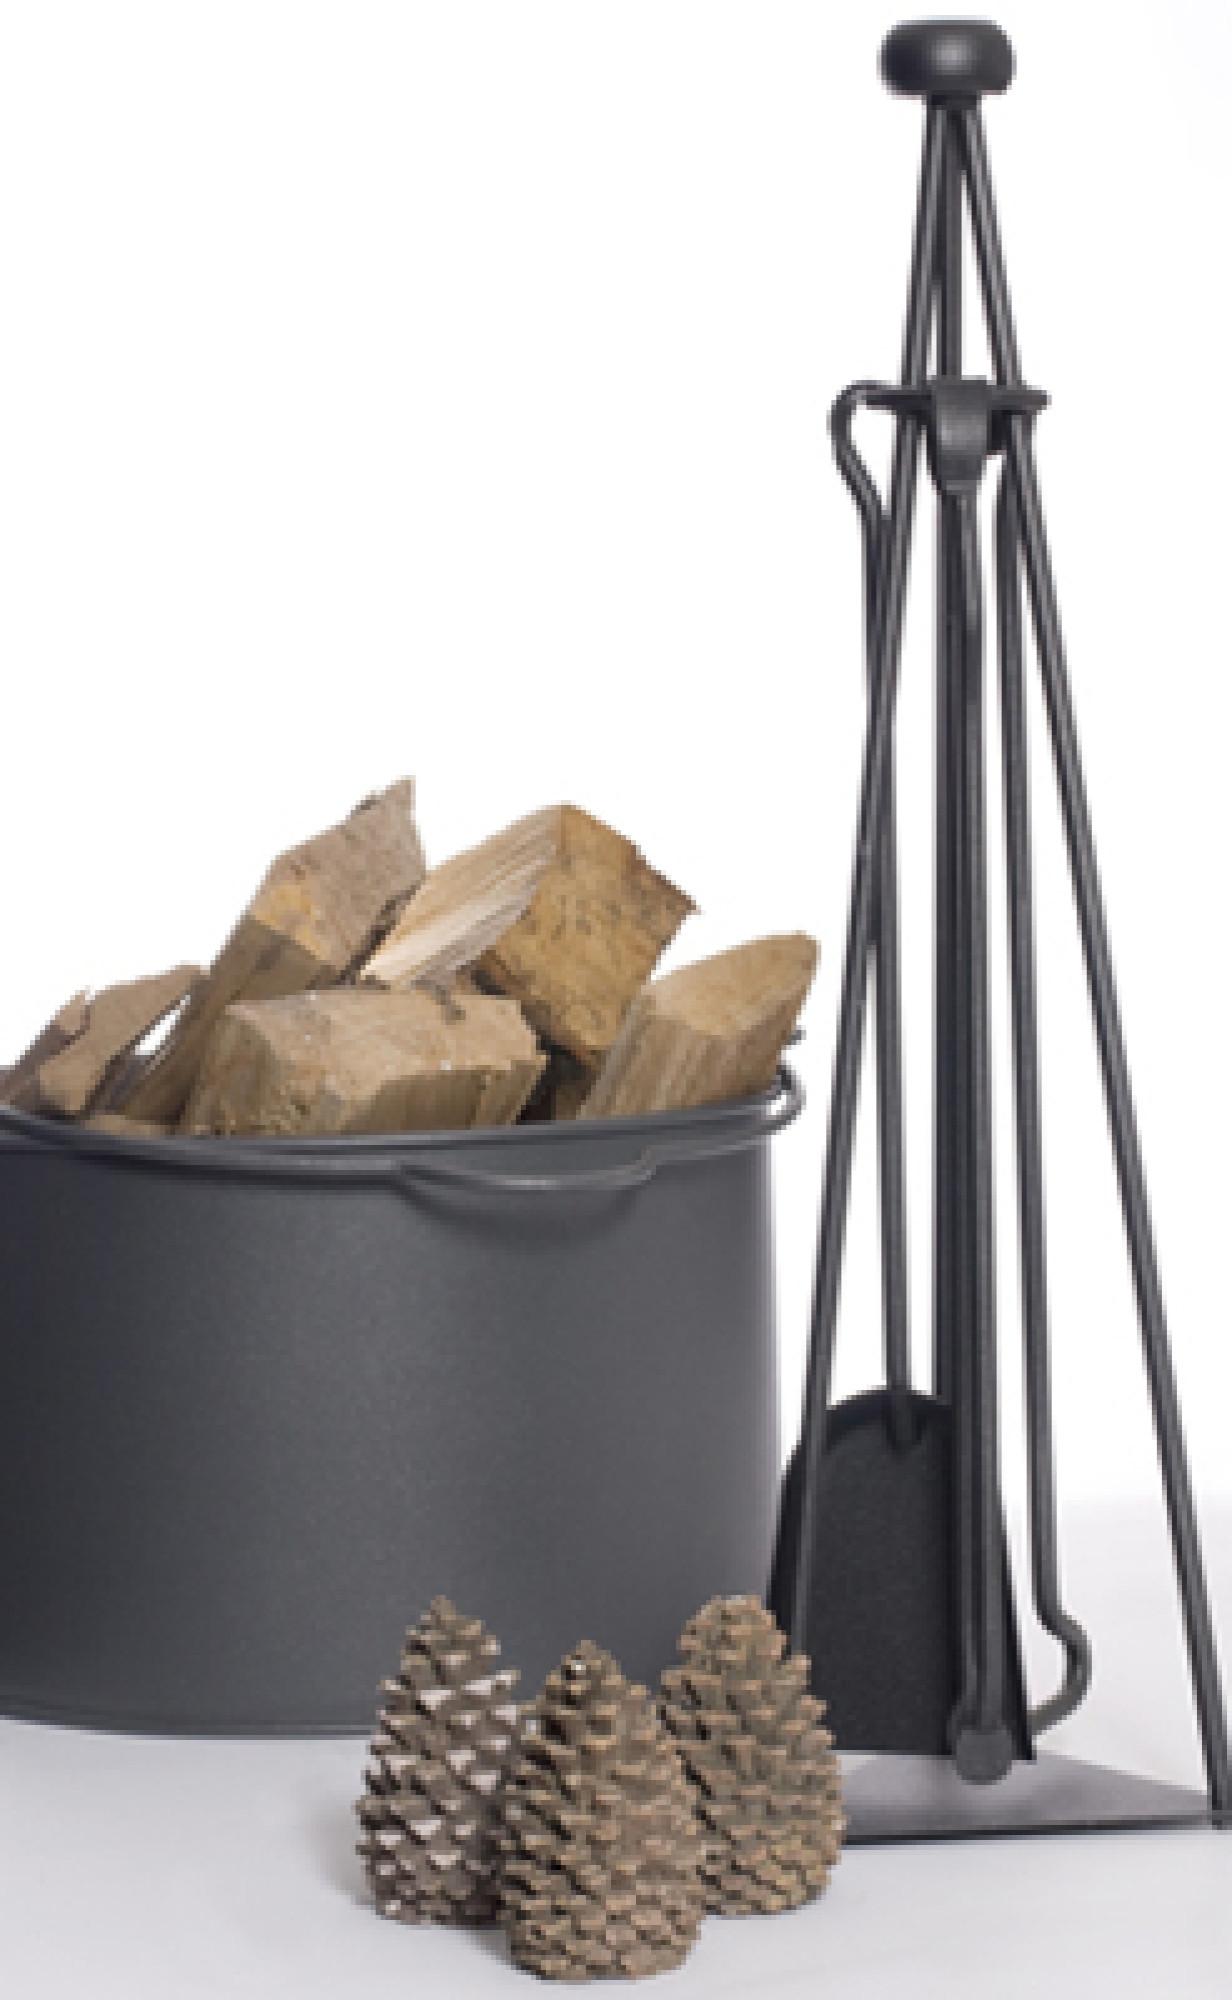 tibas-accessoires-houtbak-haardstel-dennenappels